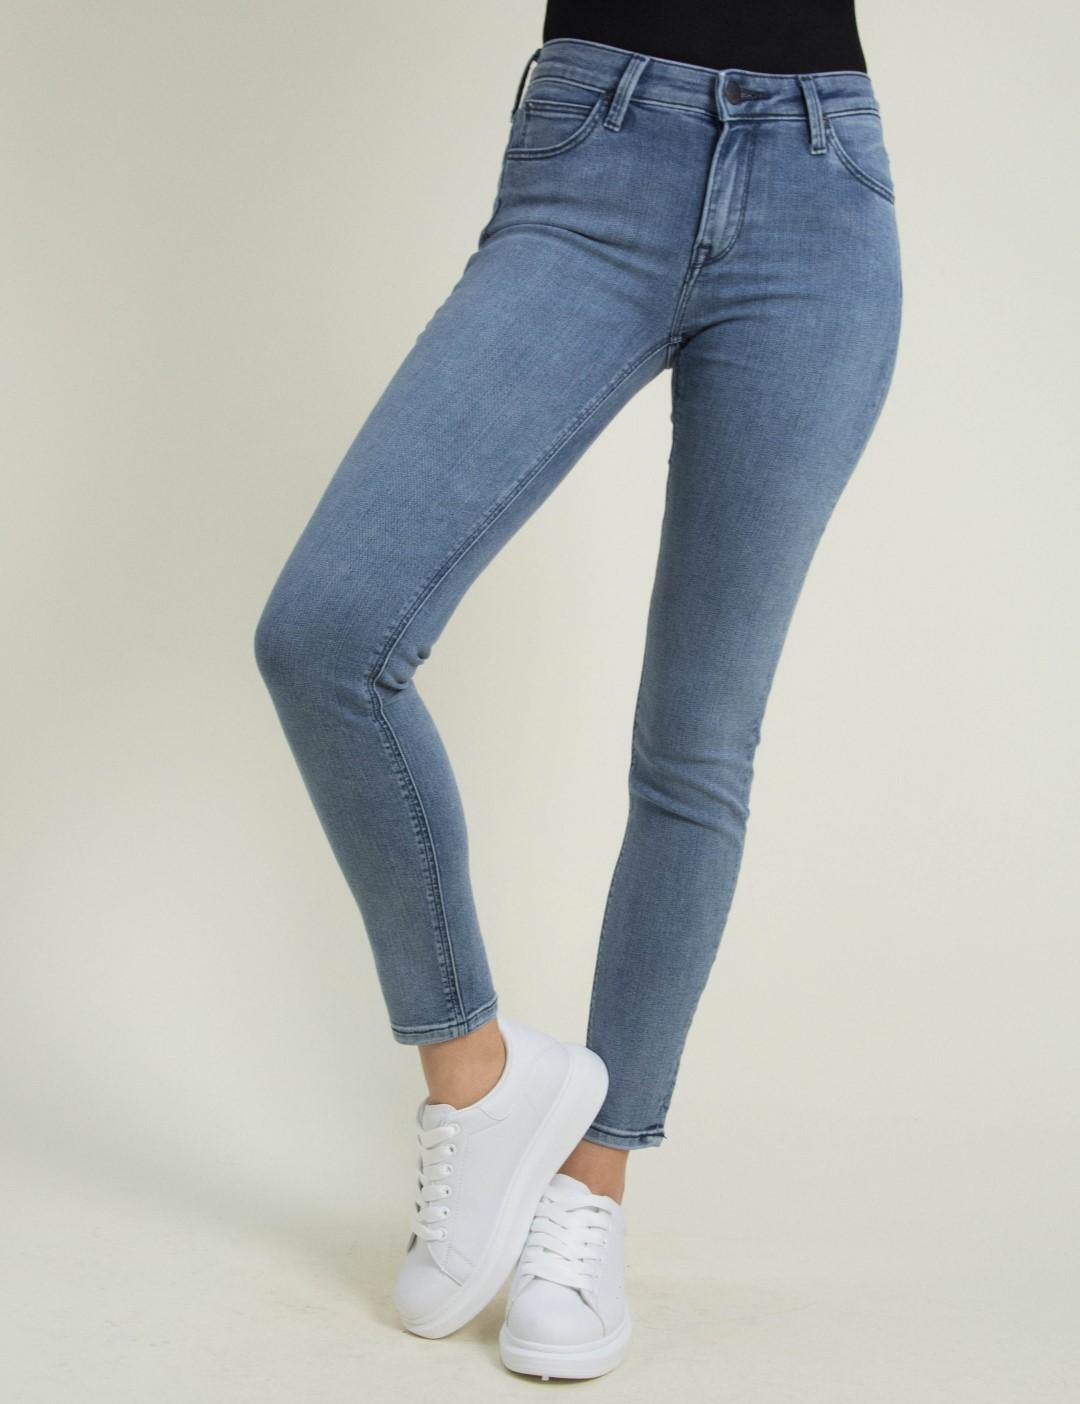 0c9e7d98e4d3 Γυναικείο μπλε τζιν παντελόνι Scarlett Skinny L526LSPS